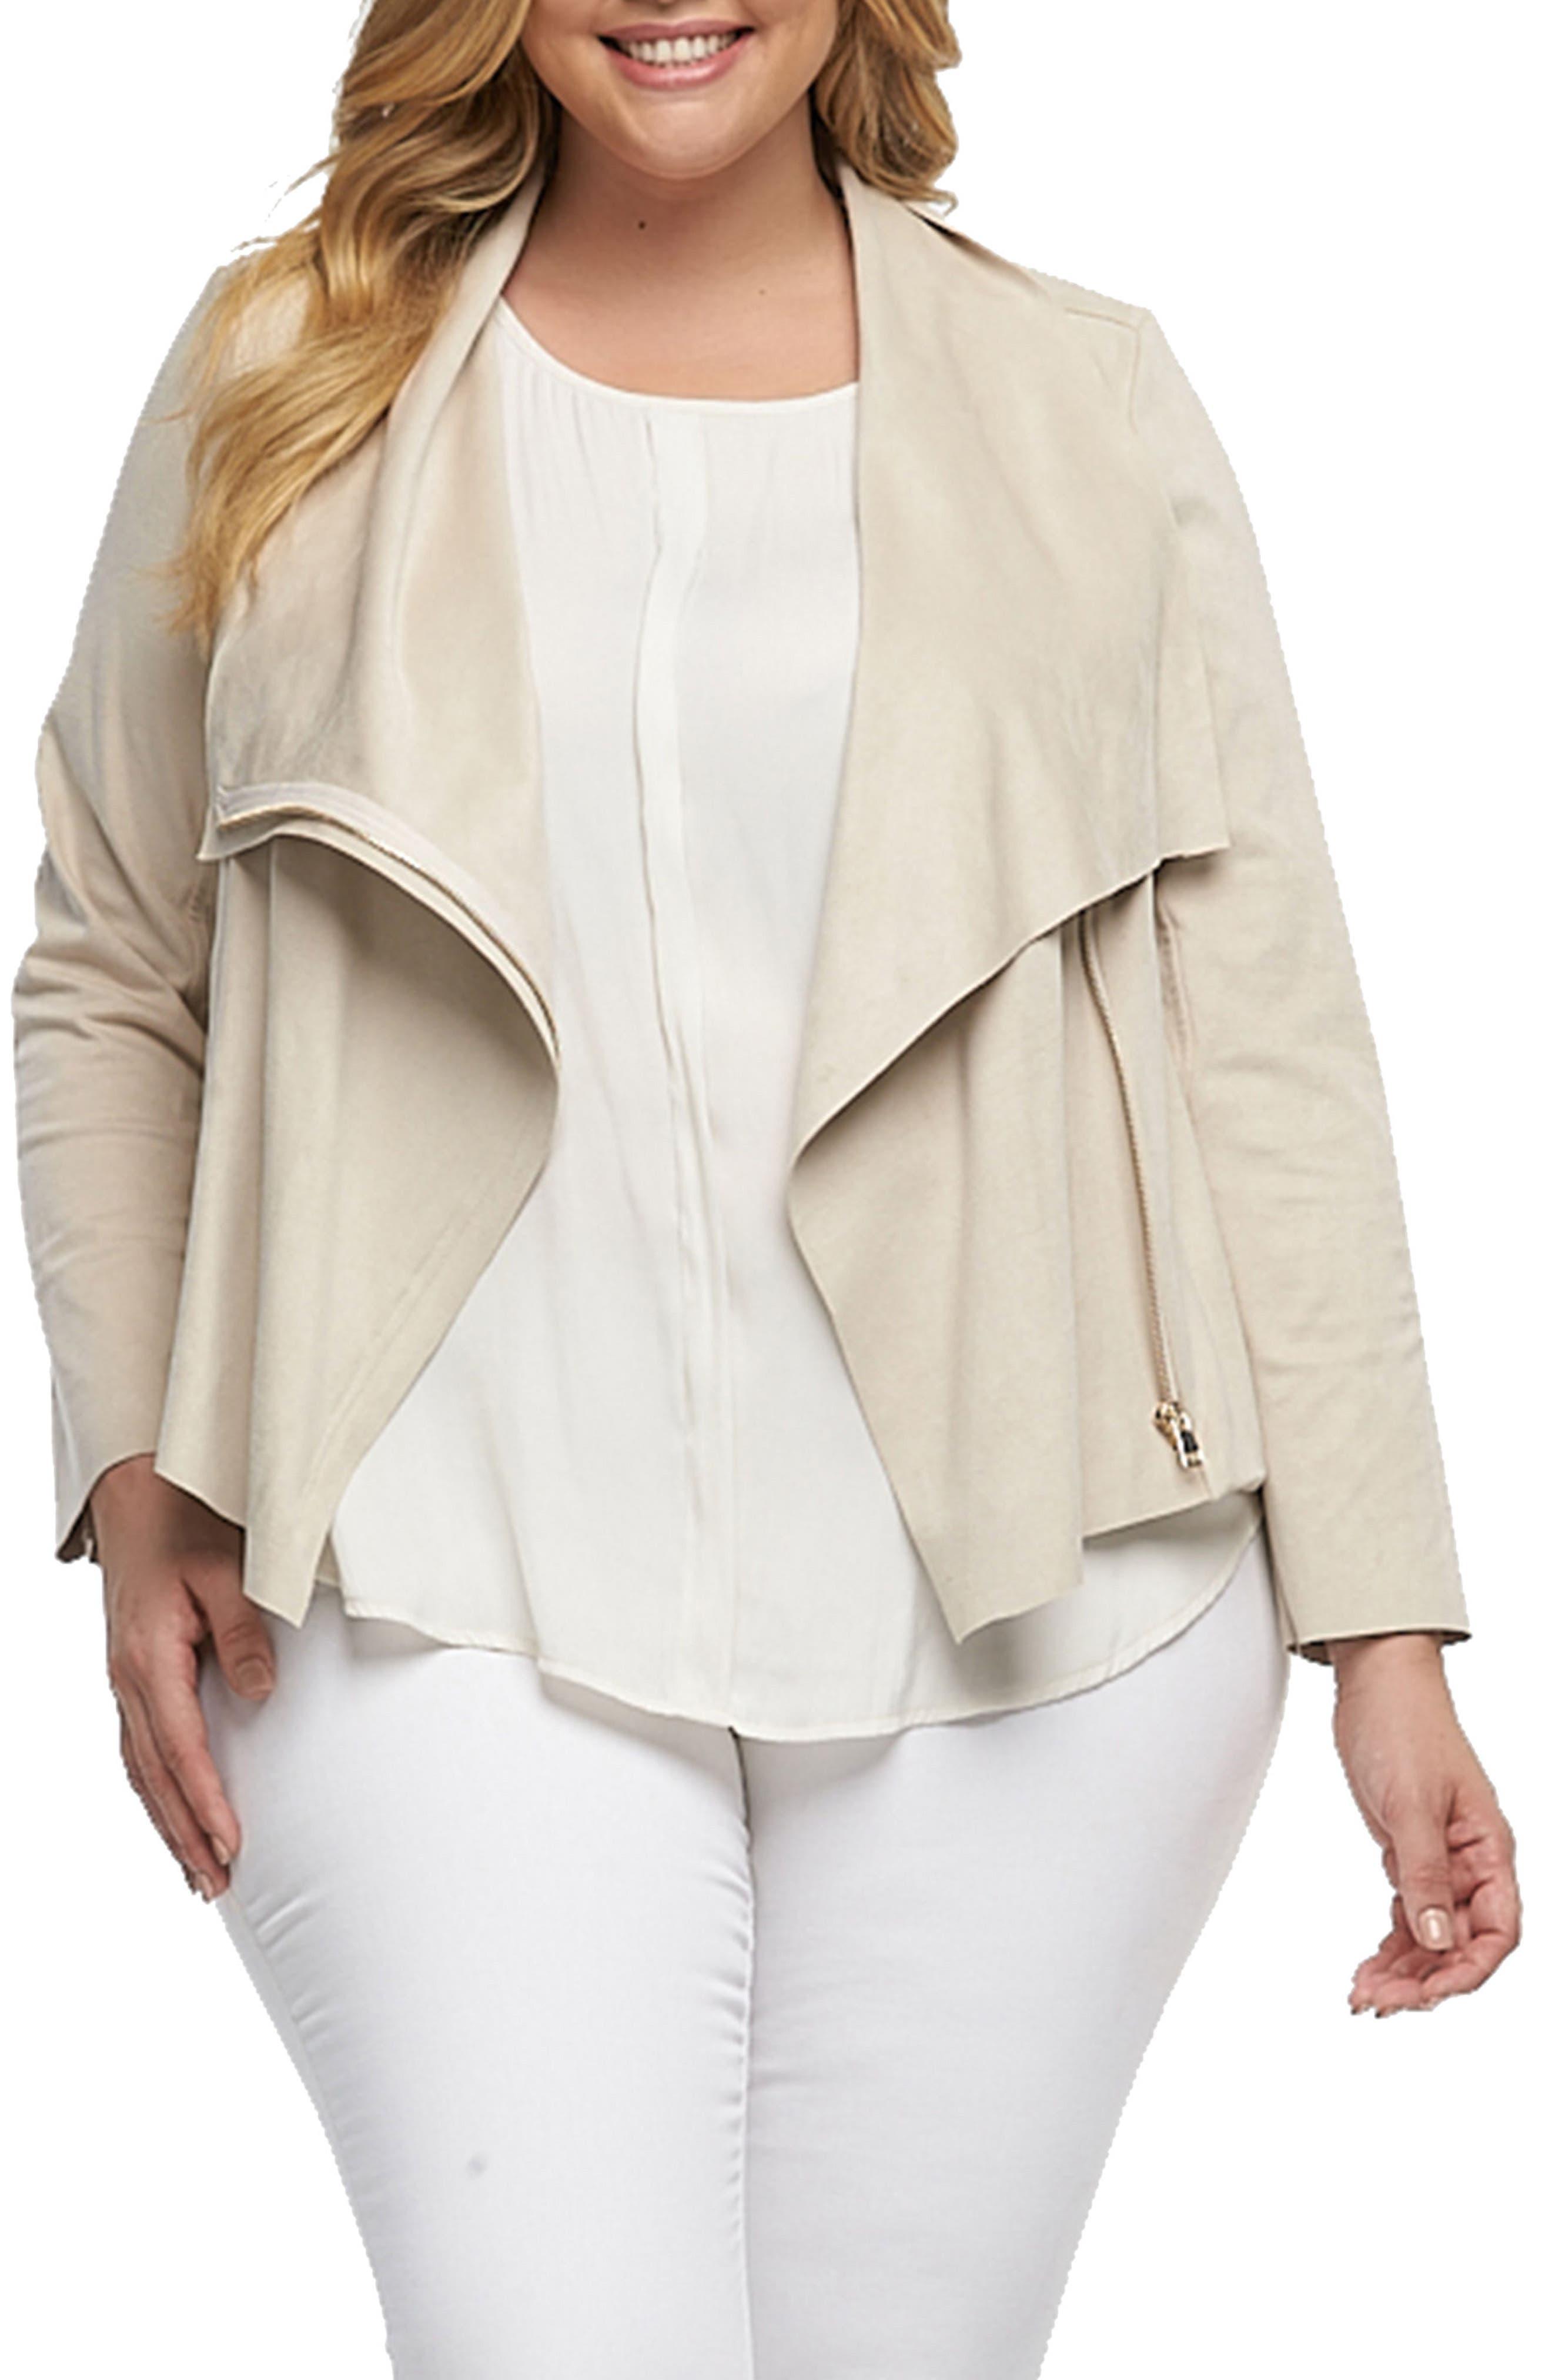 Sayna Drape Front Asymmetrical Jacket,                             Main thumbnail 1, color,                             900